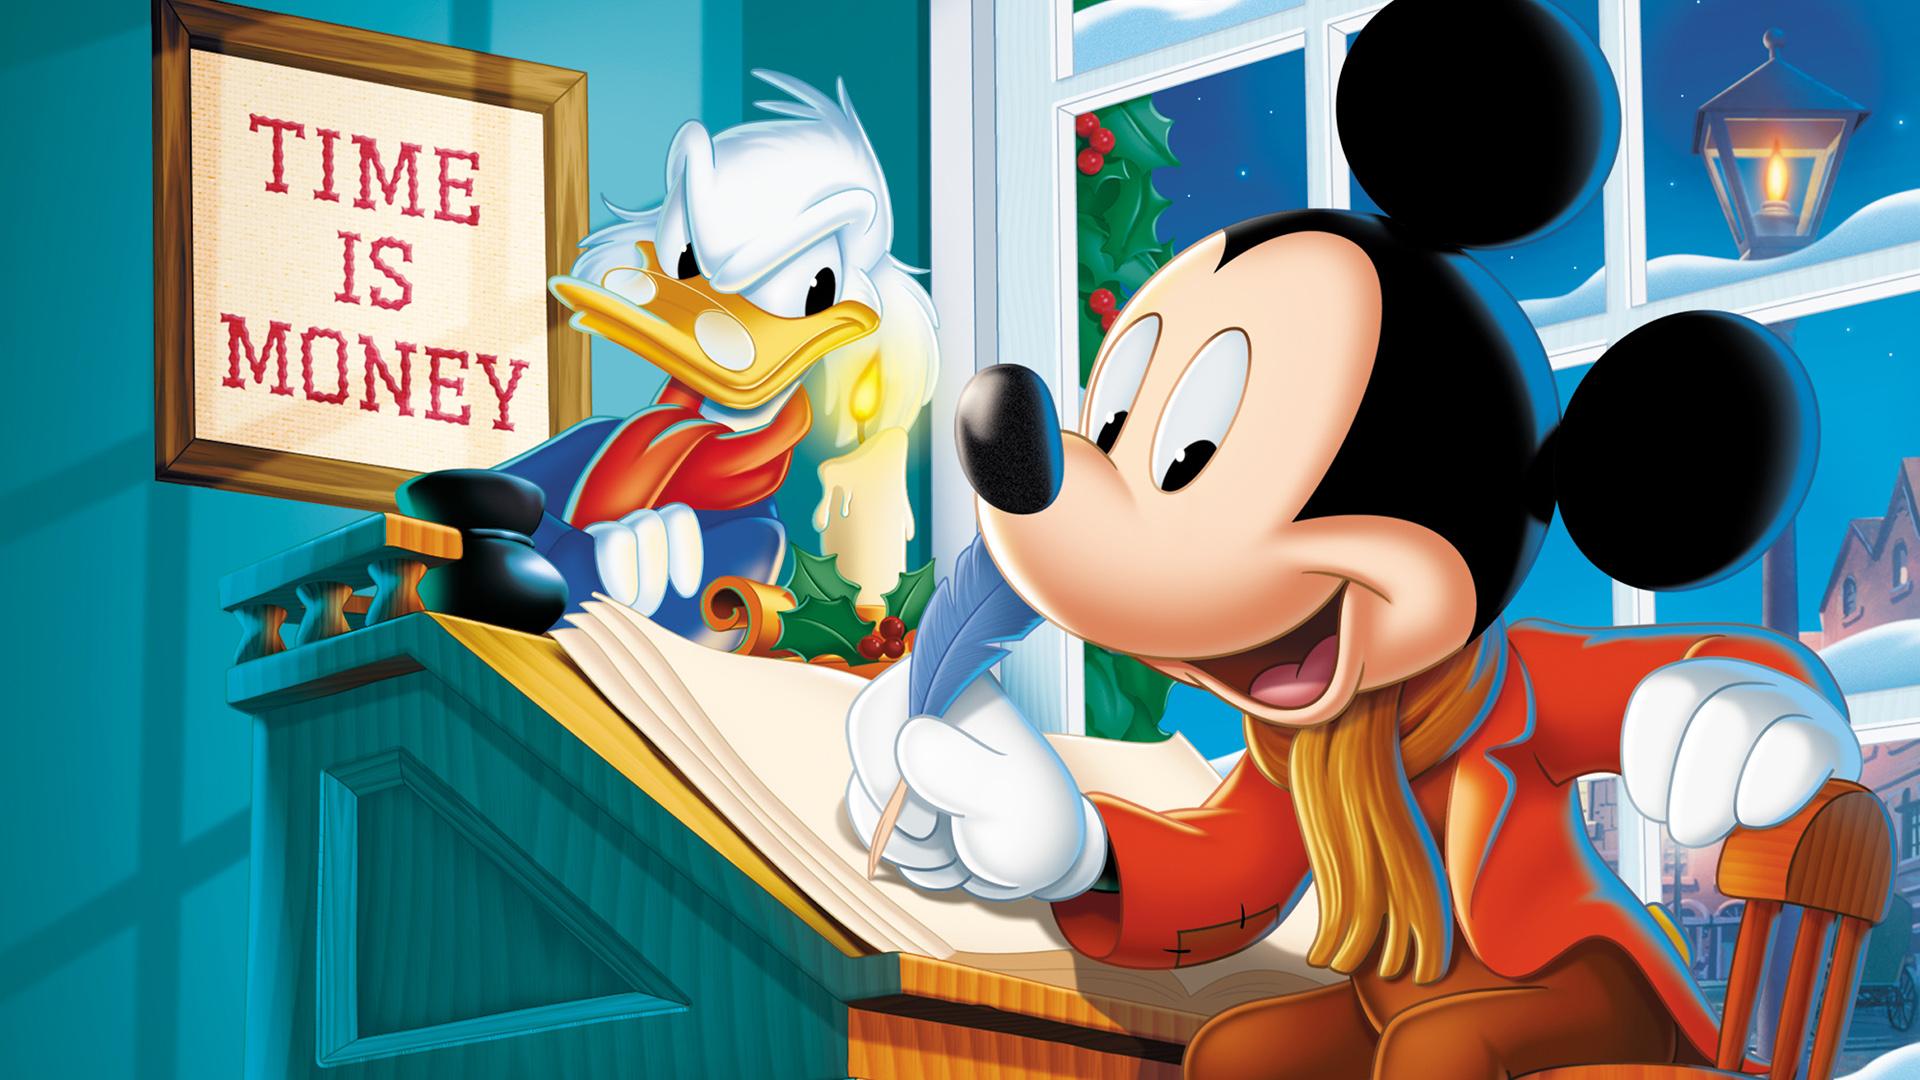 mickeys christmas carol 1983 animated movie mickey mouse donald duck wallpaper - Mickey Mouse Christmas Movie